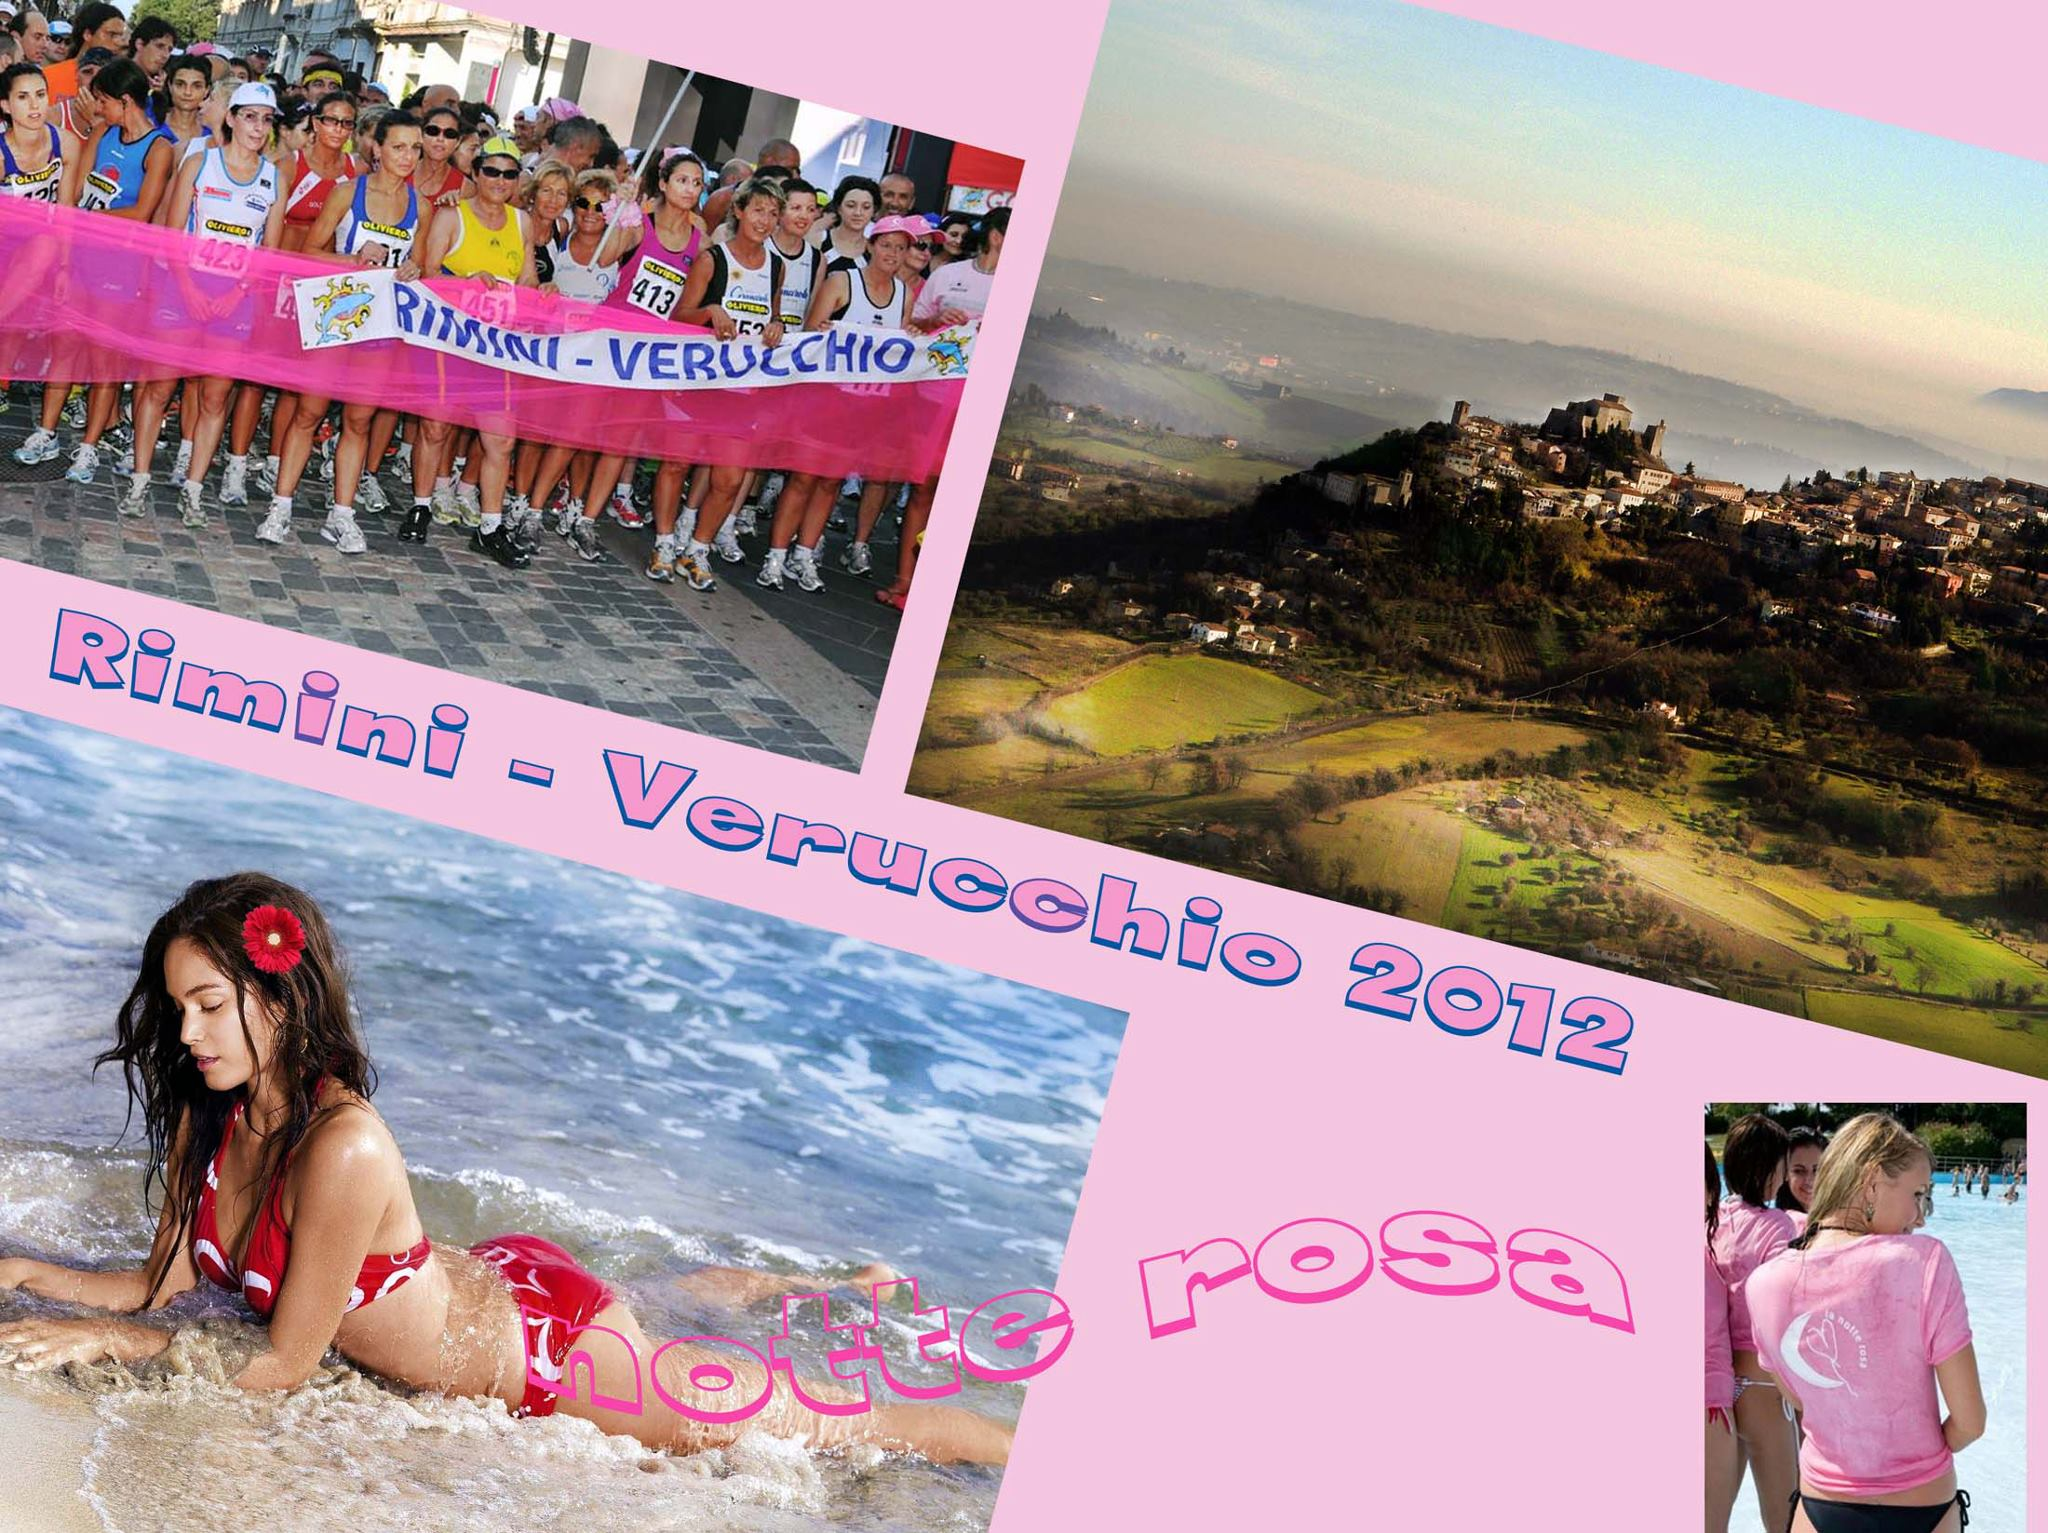 29° maratona Rimini-Verucchio